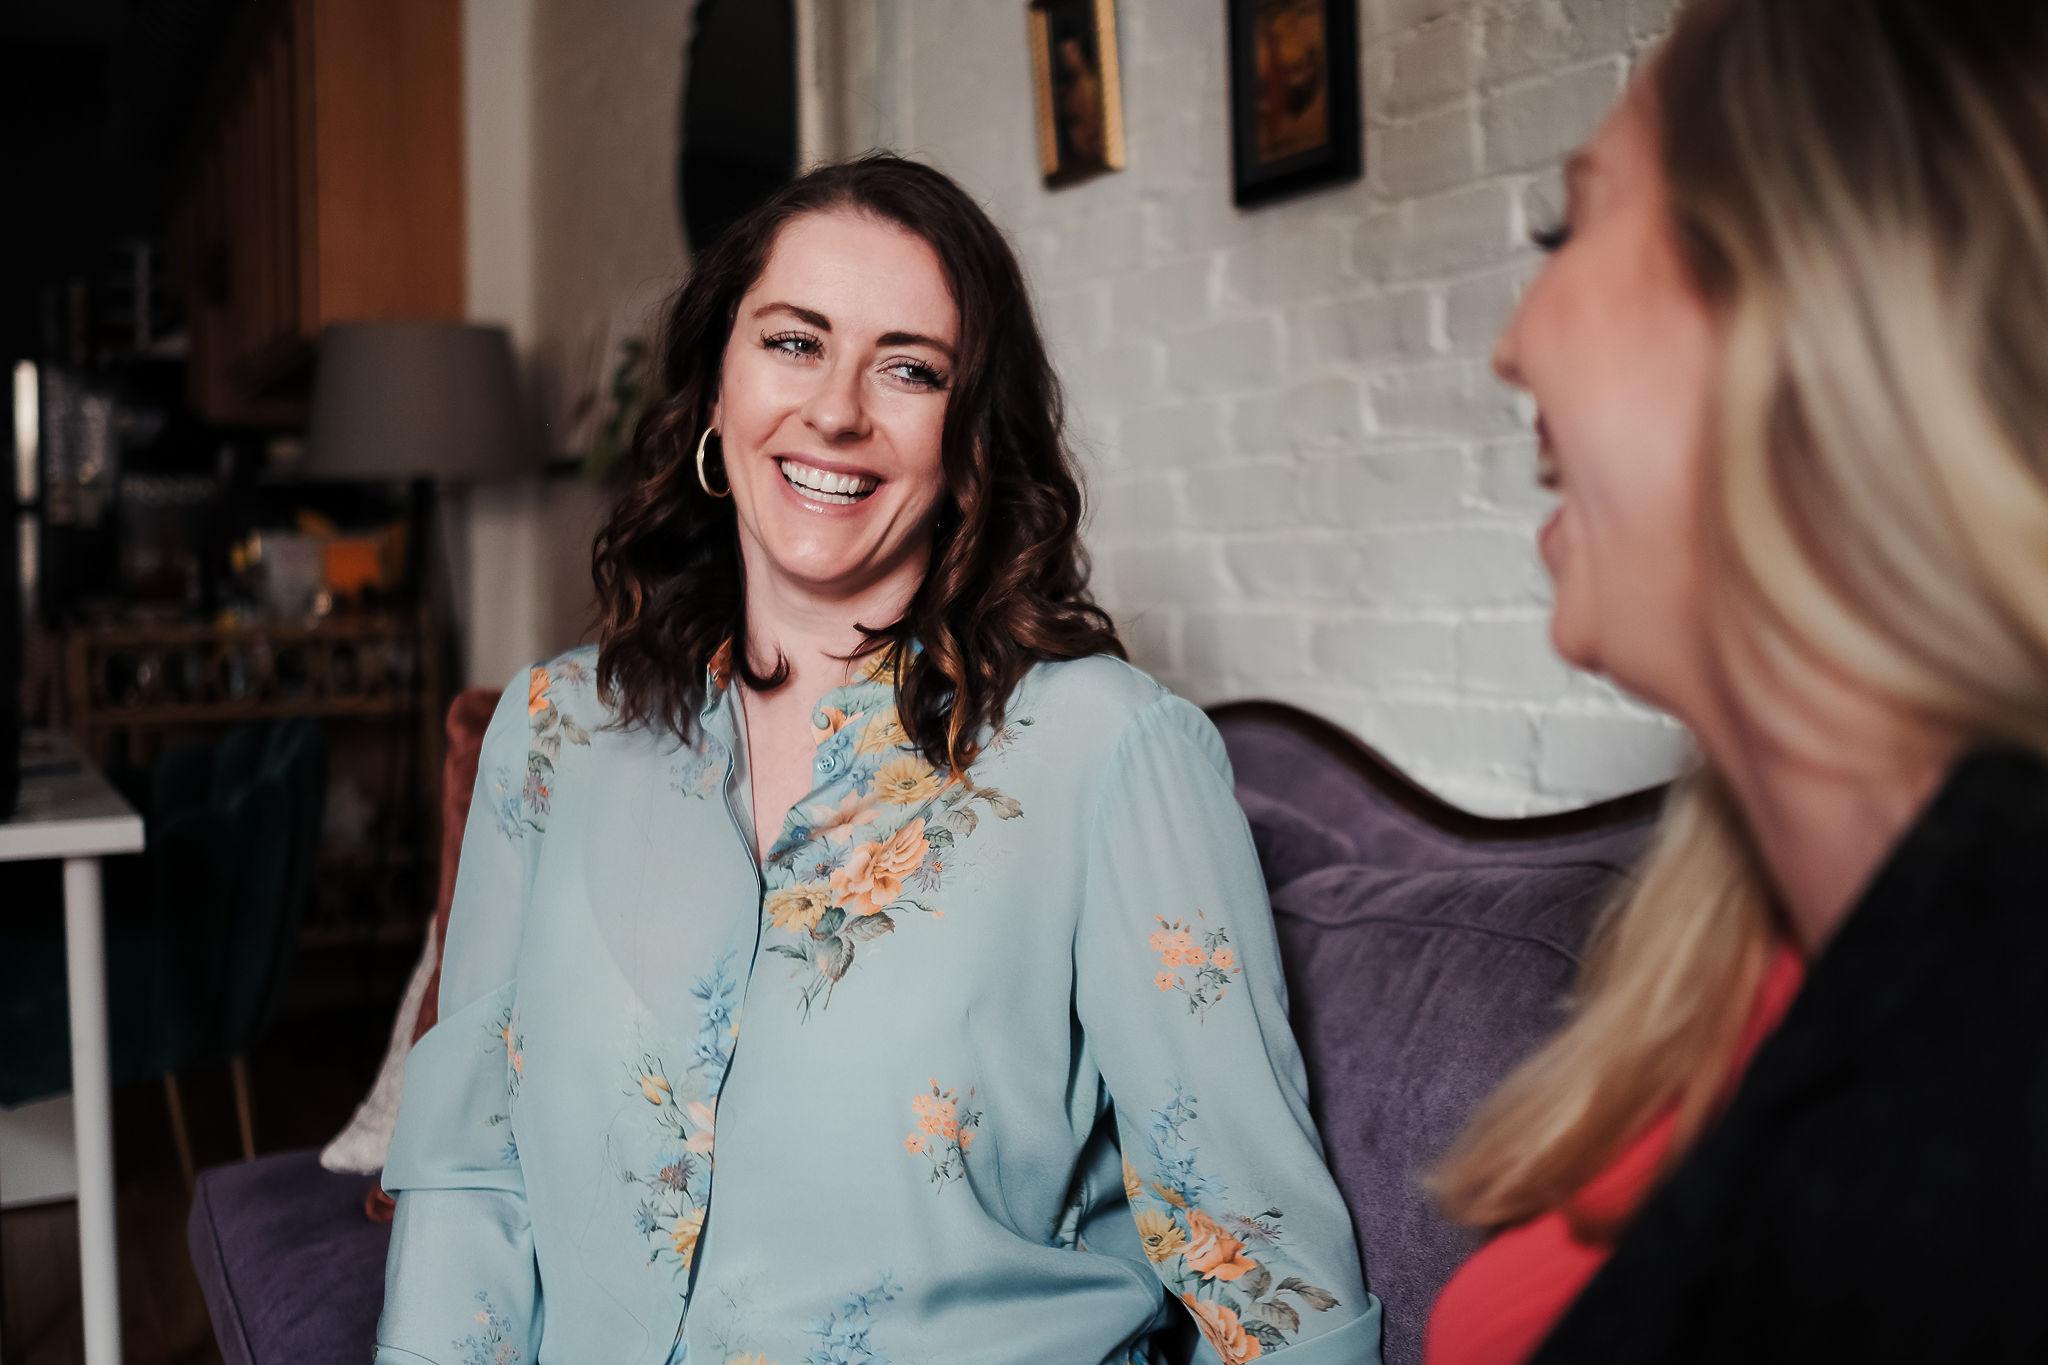 About Liz Vaysman - Meet The Founder